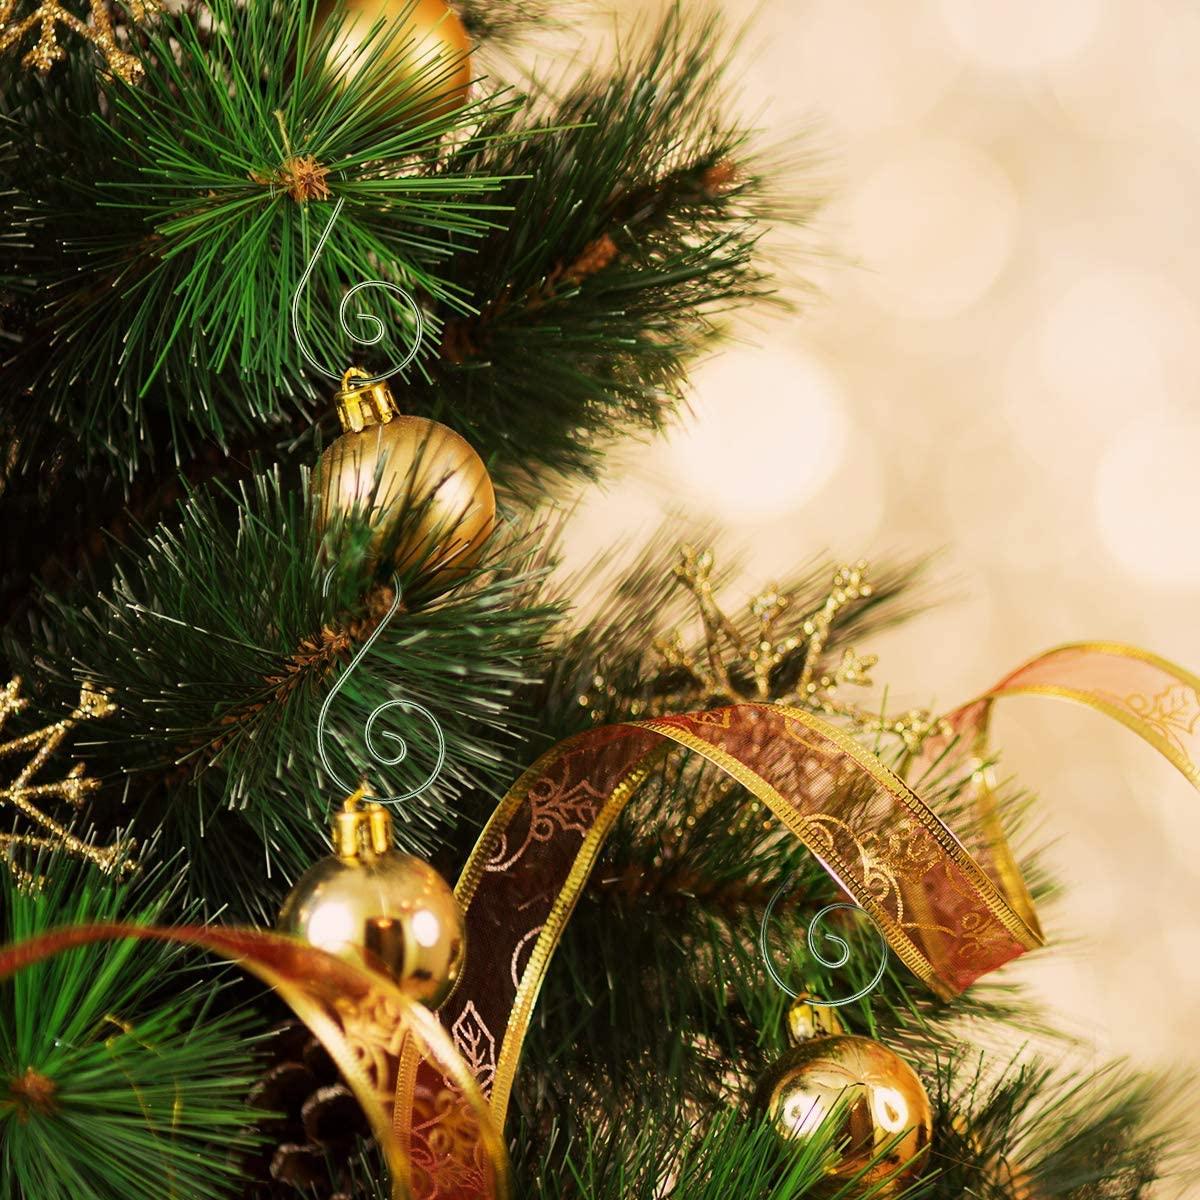 Ornament Hooks, Christmas Ornament S-shaped Hooks Christmas Tree Hanger for Christmas Decorations 100 Pack